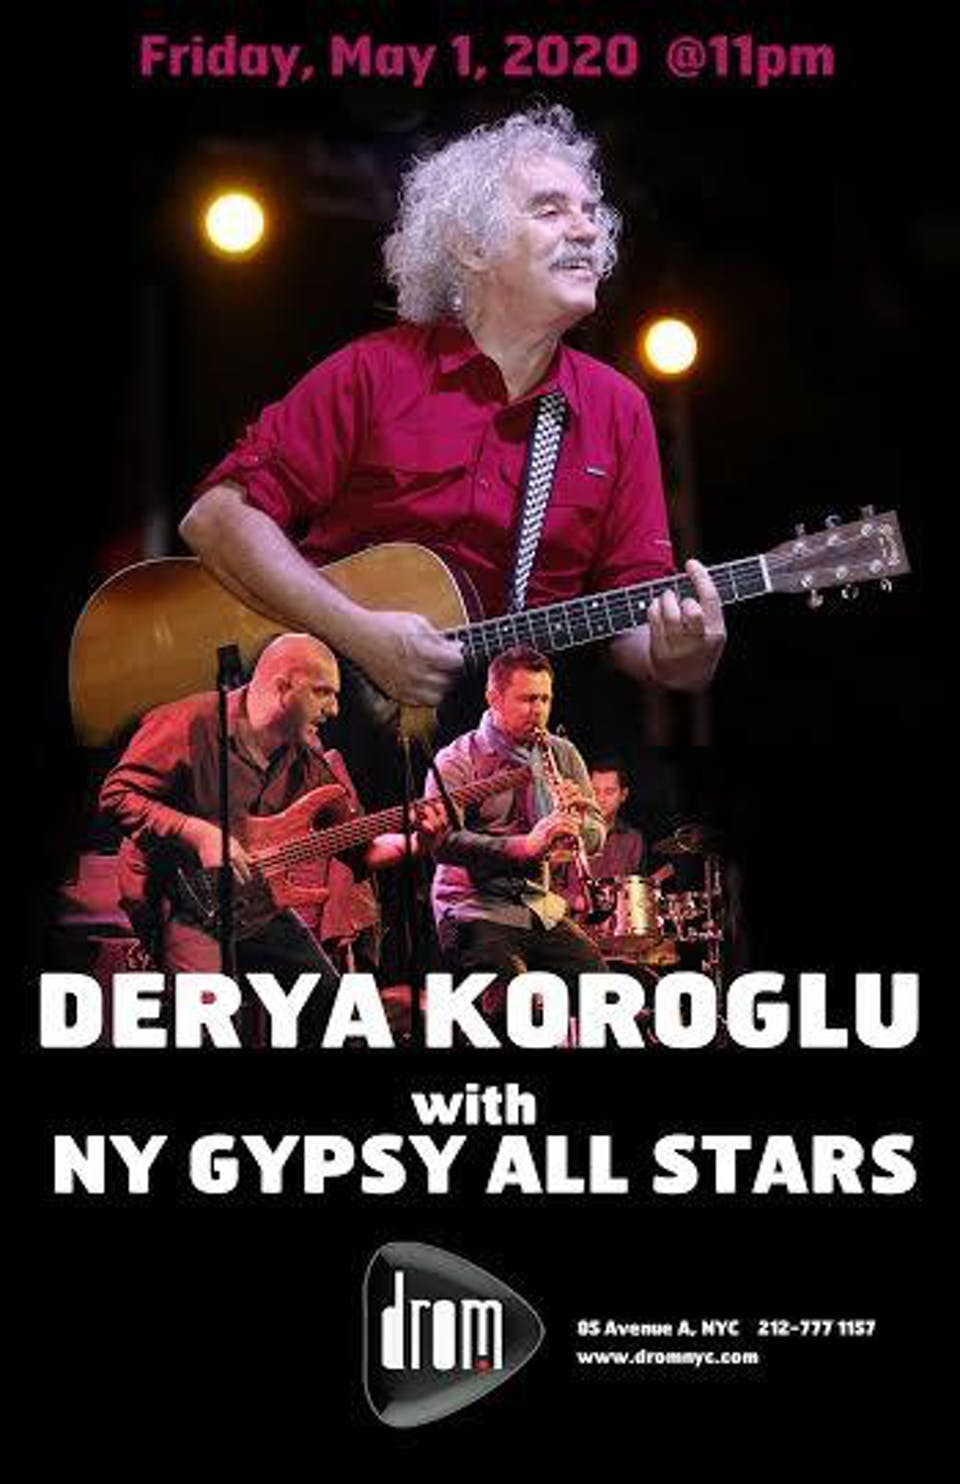 Derya Koroglu with The New York Gypsy All-Stars